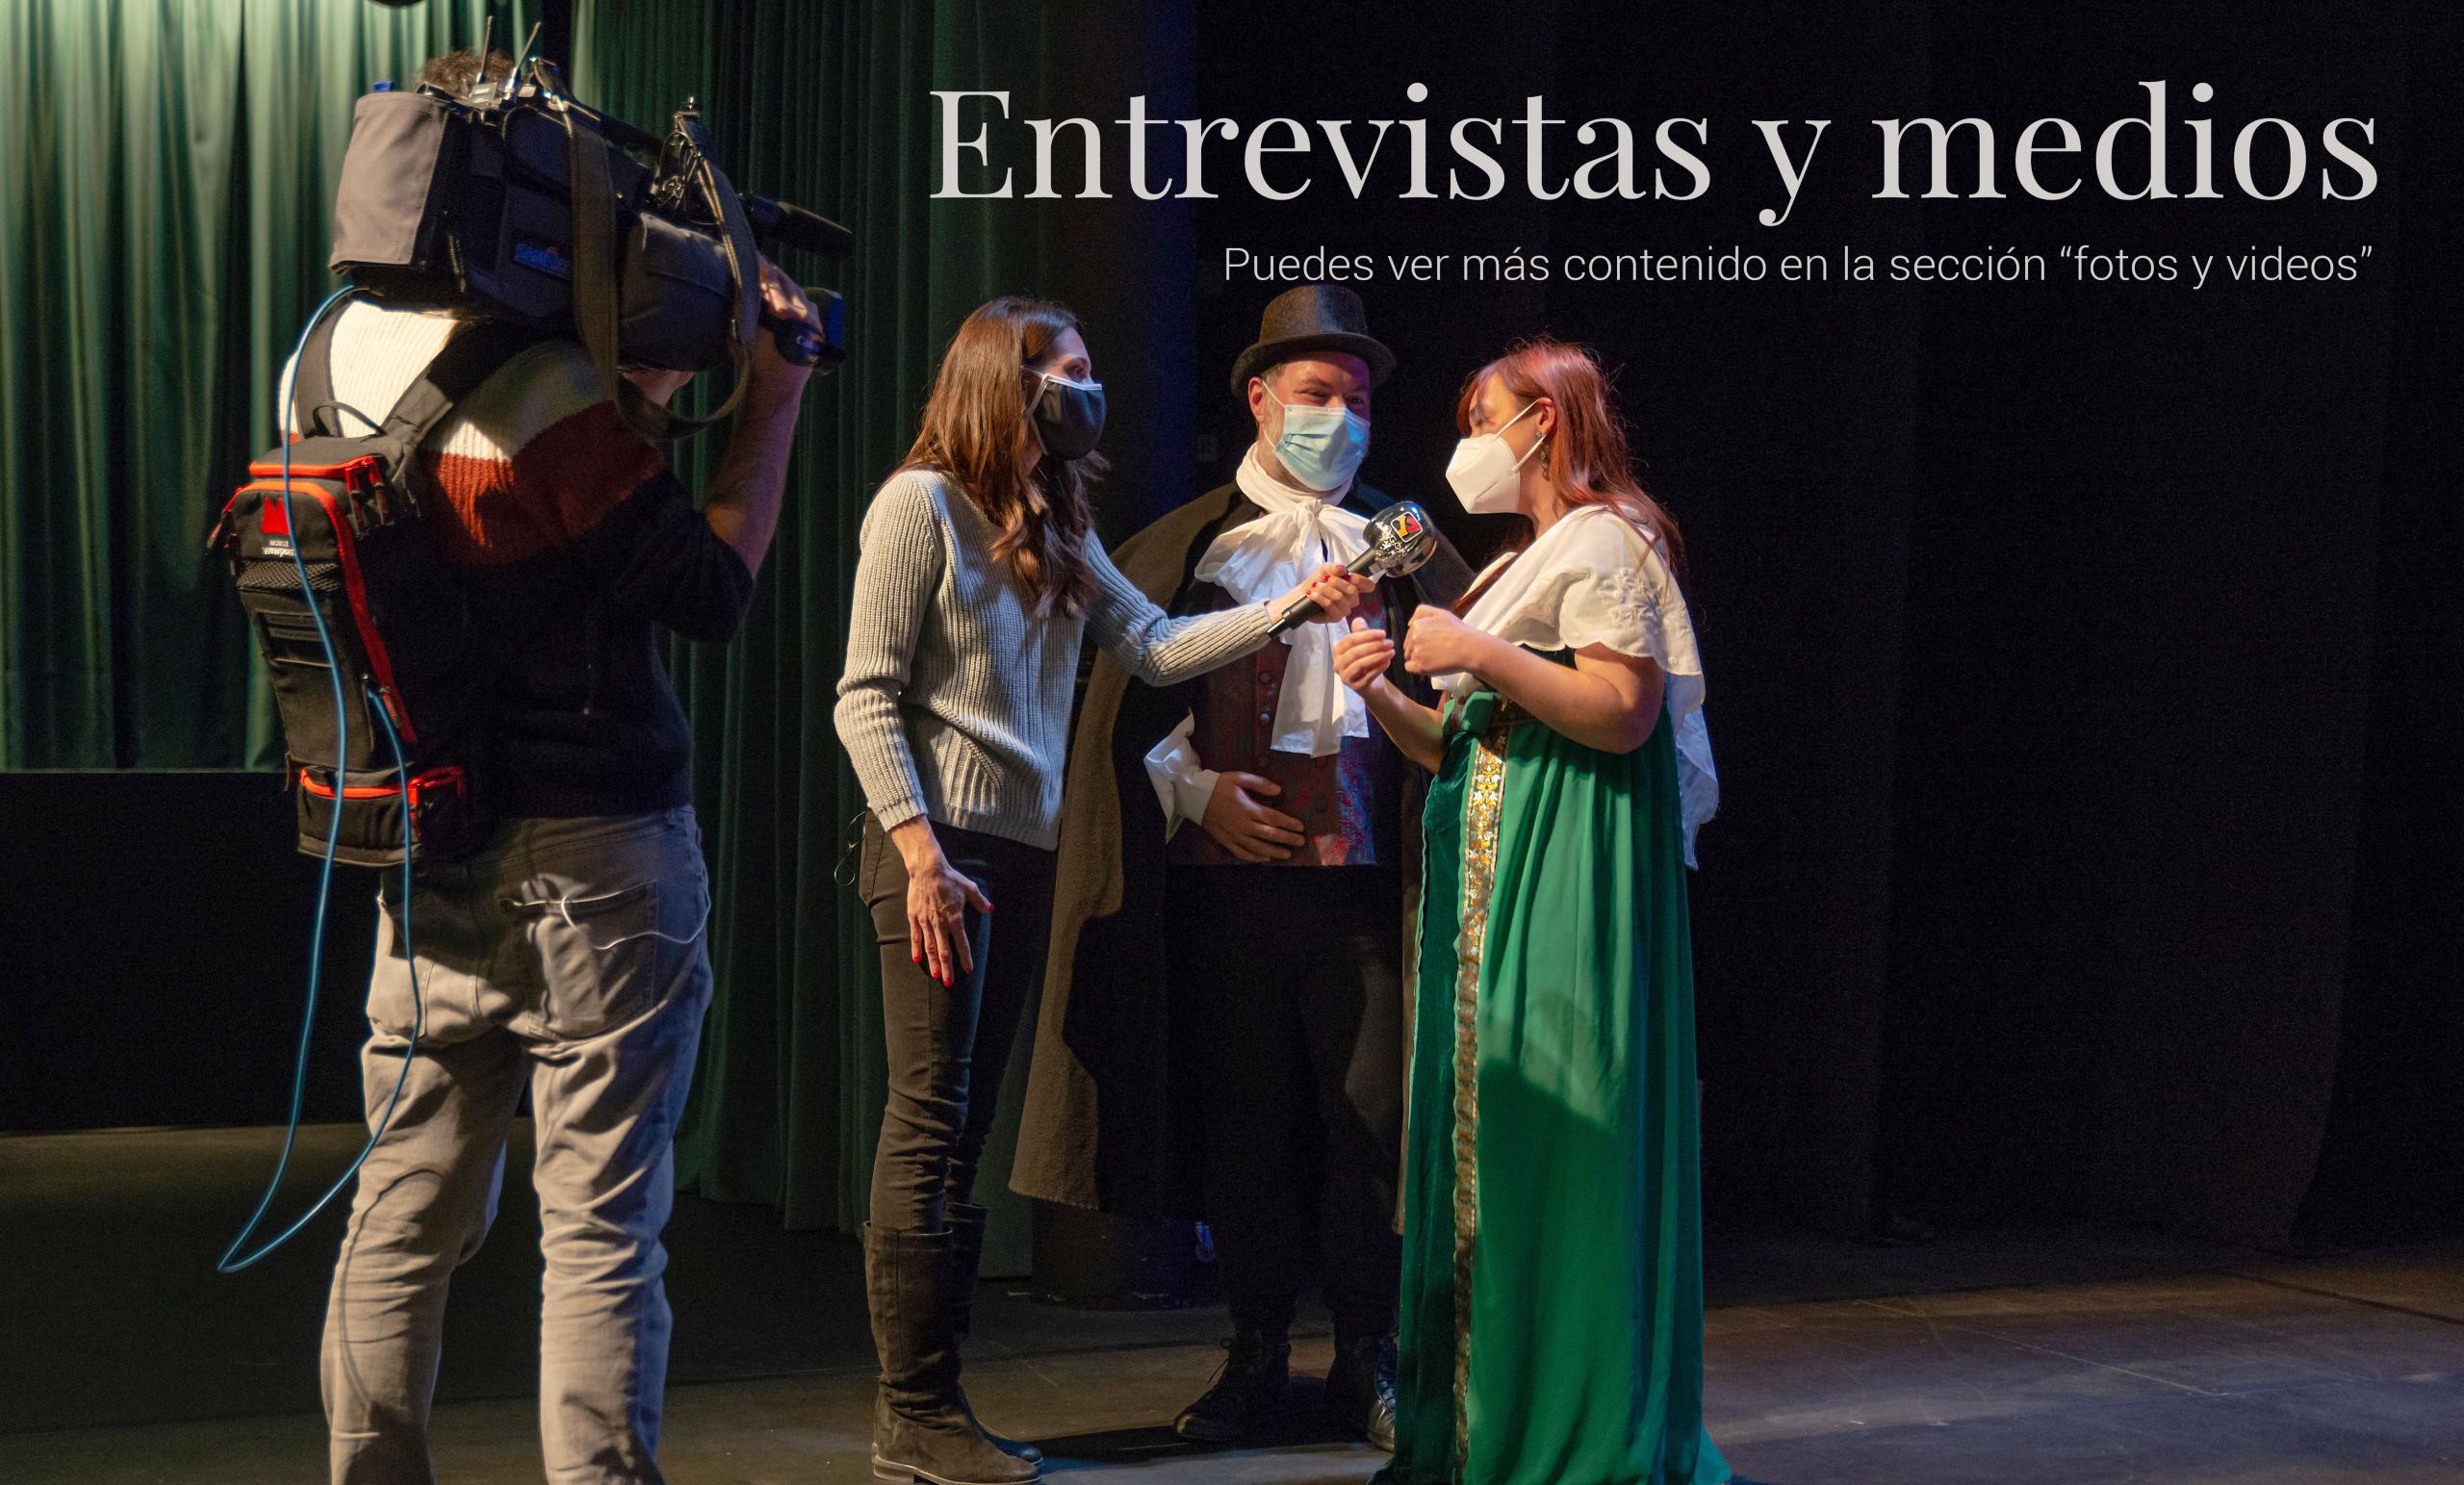 https://goyaenfuendetodos.com/multimedia/